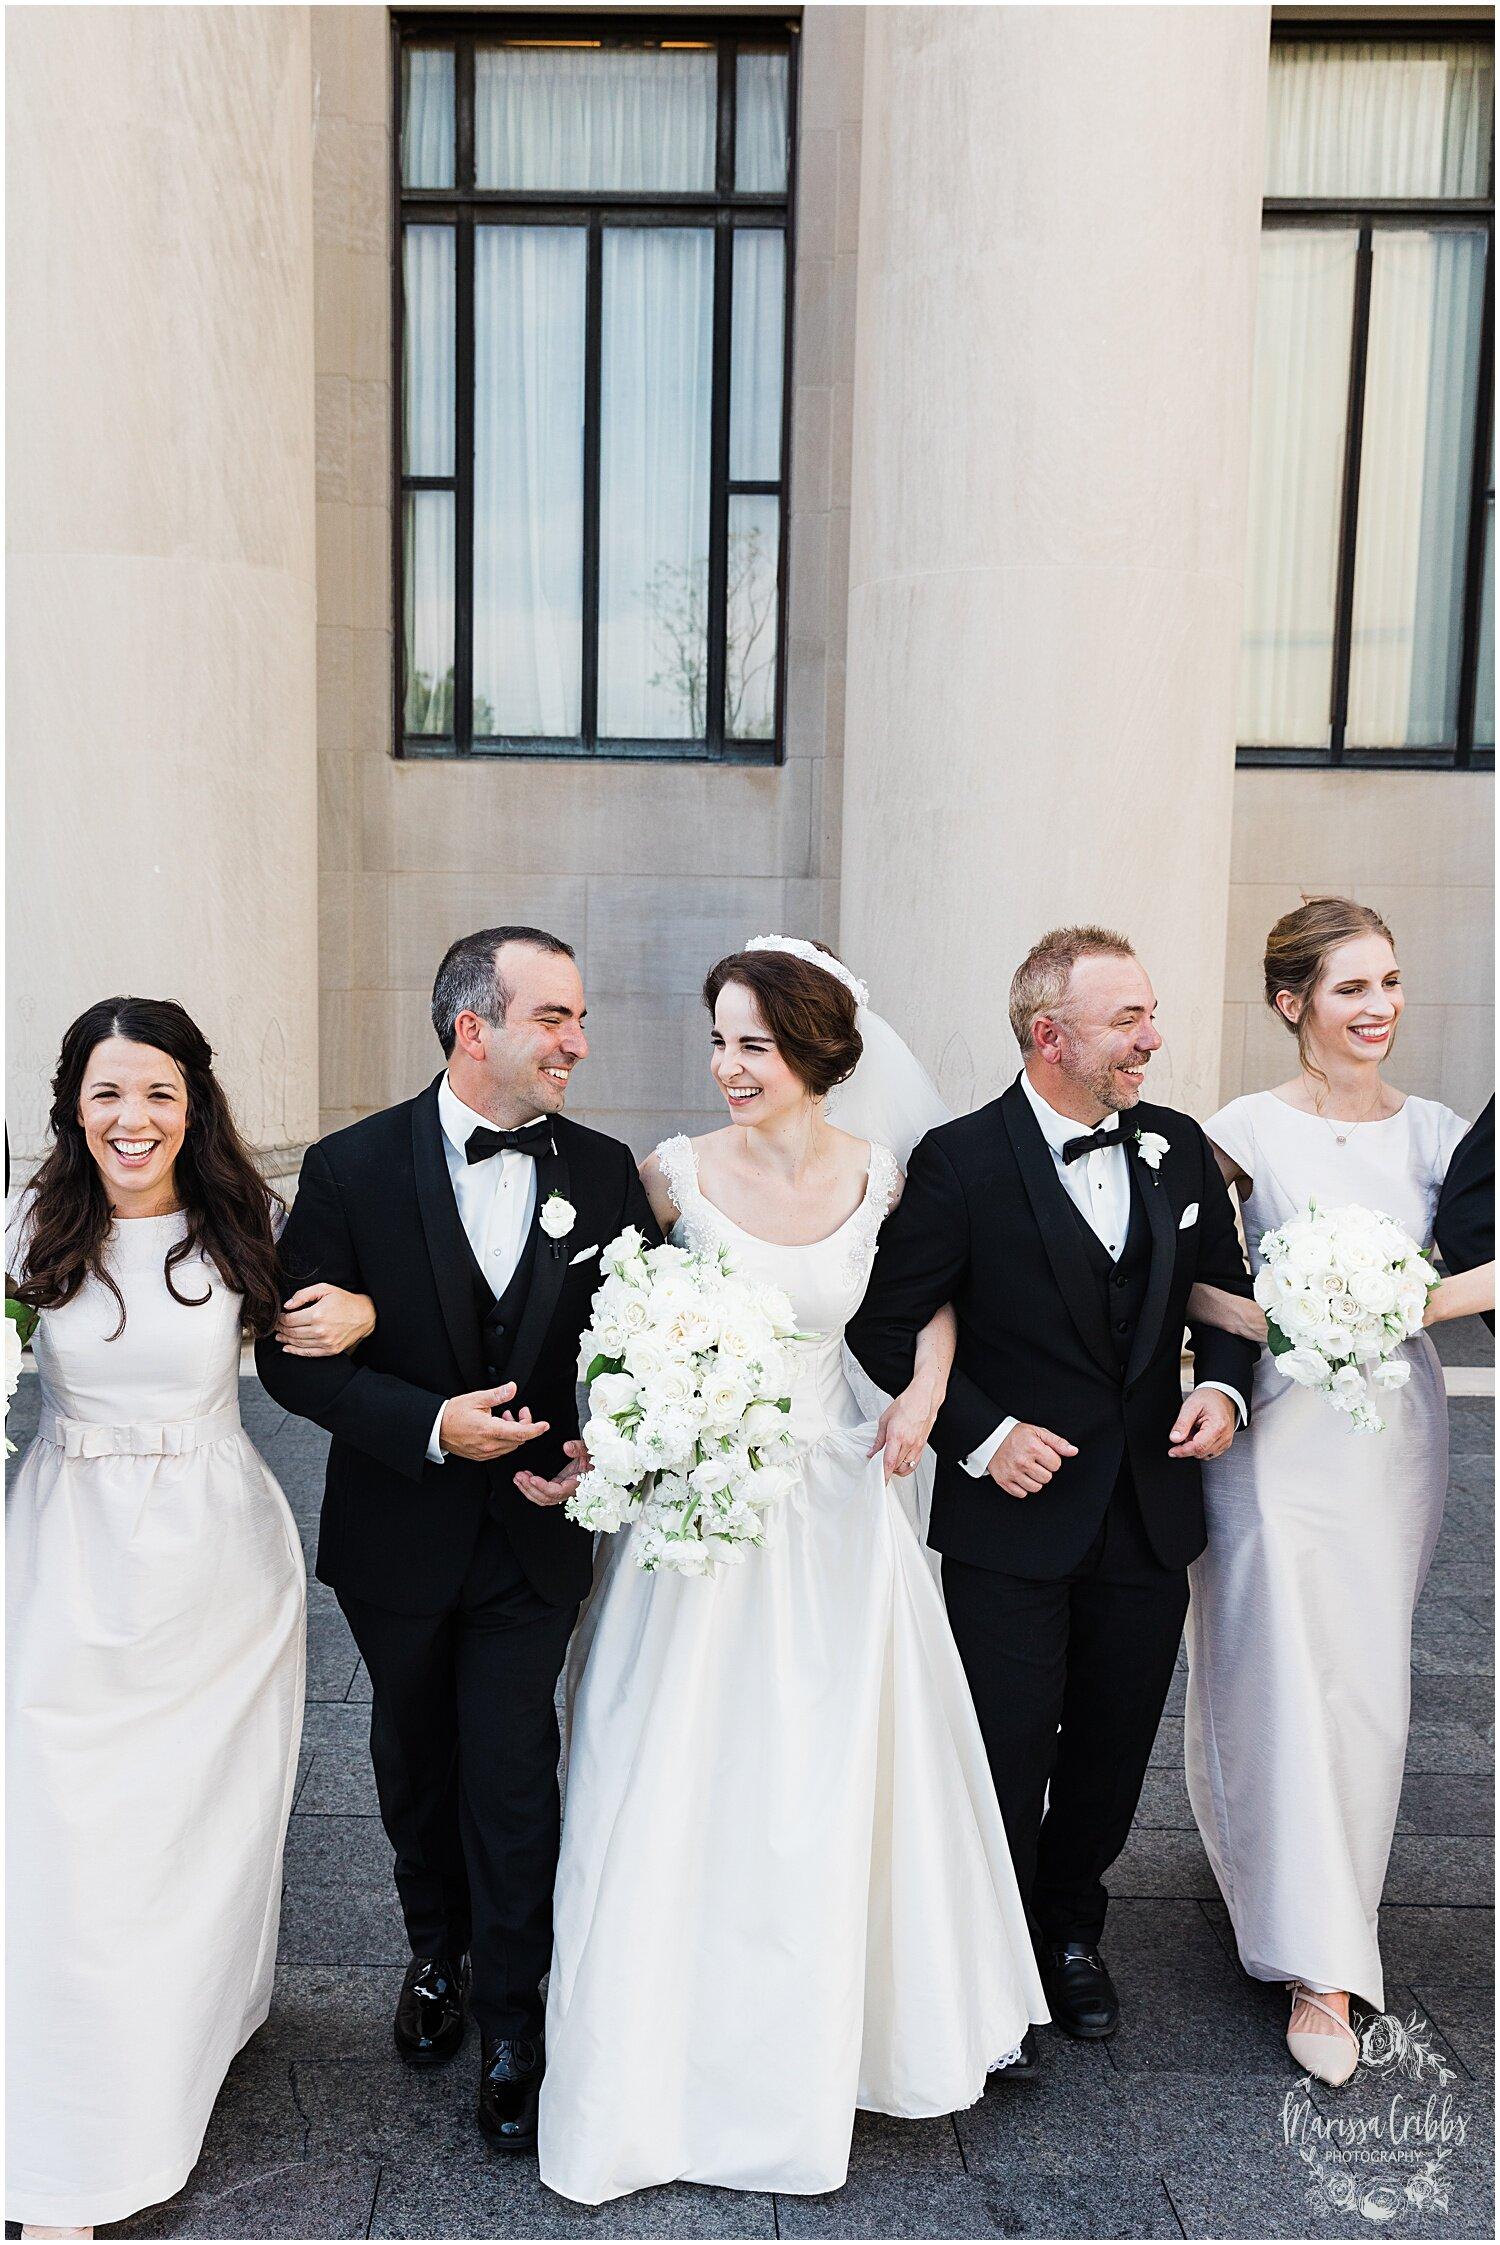 TYLER & CAROLINE MARRIED BLOG | MARISSA CRIBBS PHOTOGRAPHY | THE CARRIAGE CLUB | KANSAS CITY WEDDING PHOTOS_9237.jpg